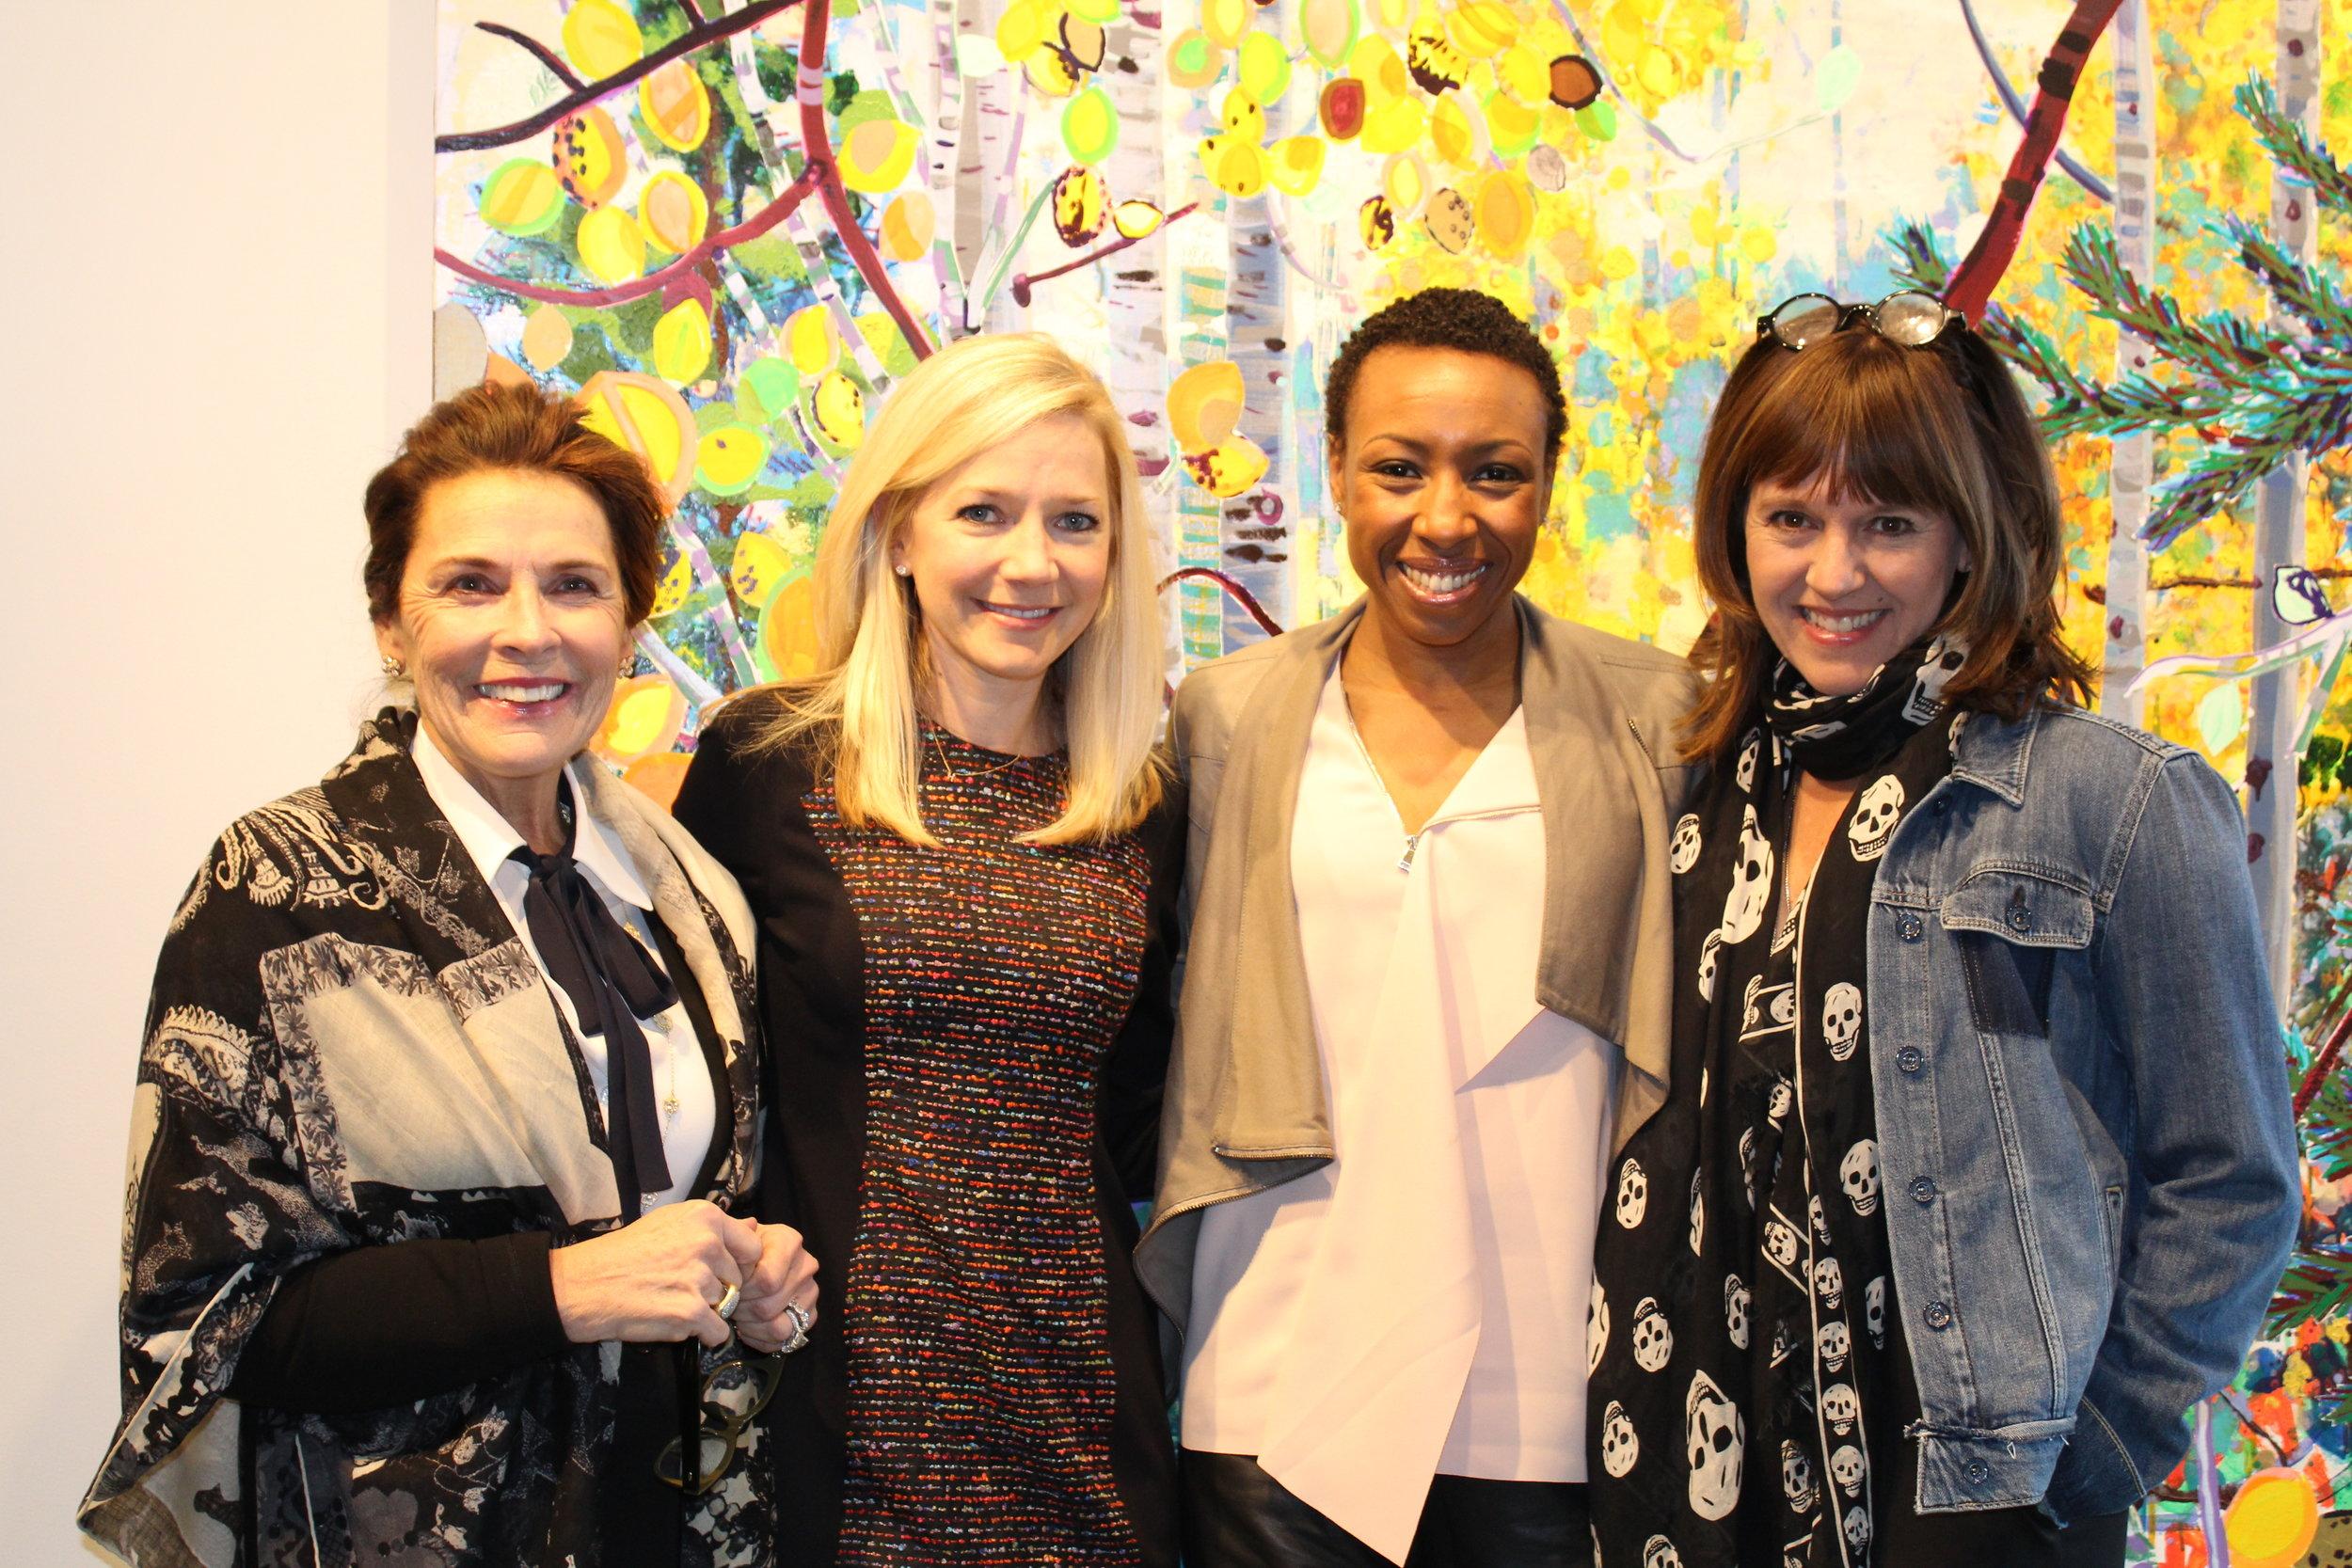 Diane Stewart, Sarah Burney, Tiffany Dufu and Jacki Zehner